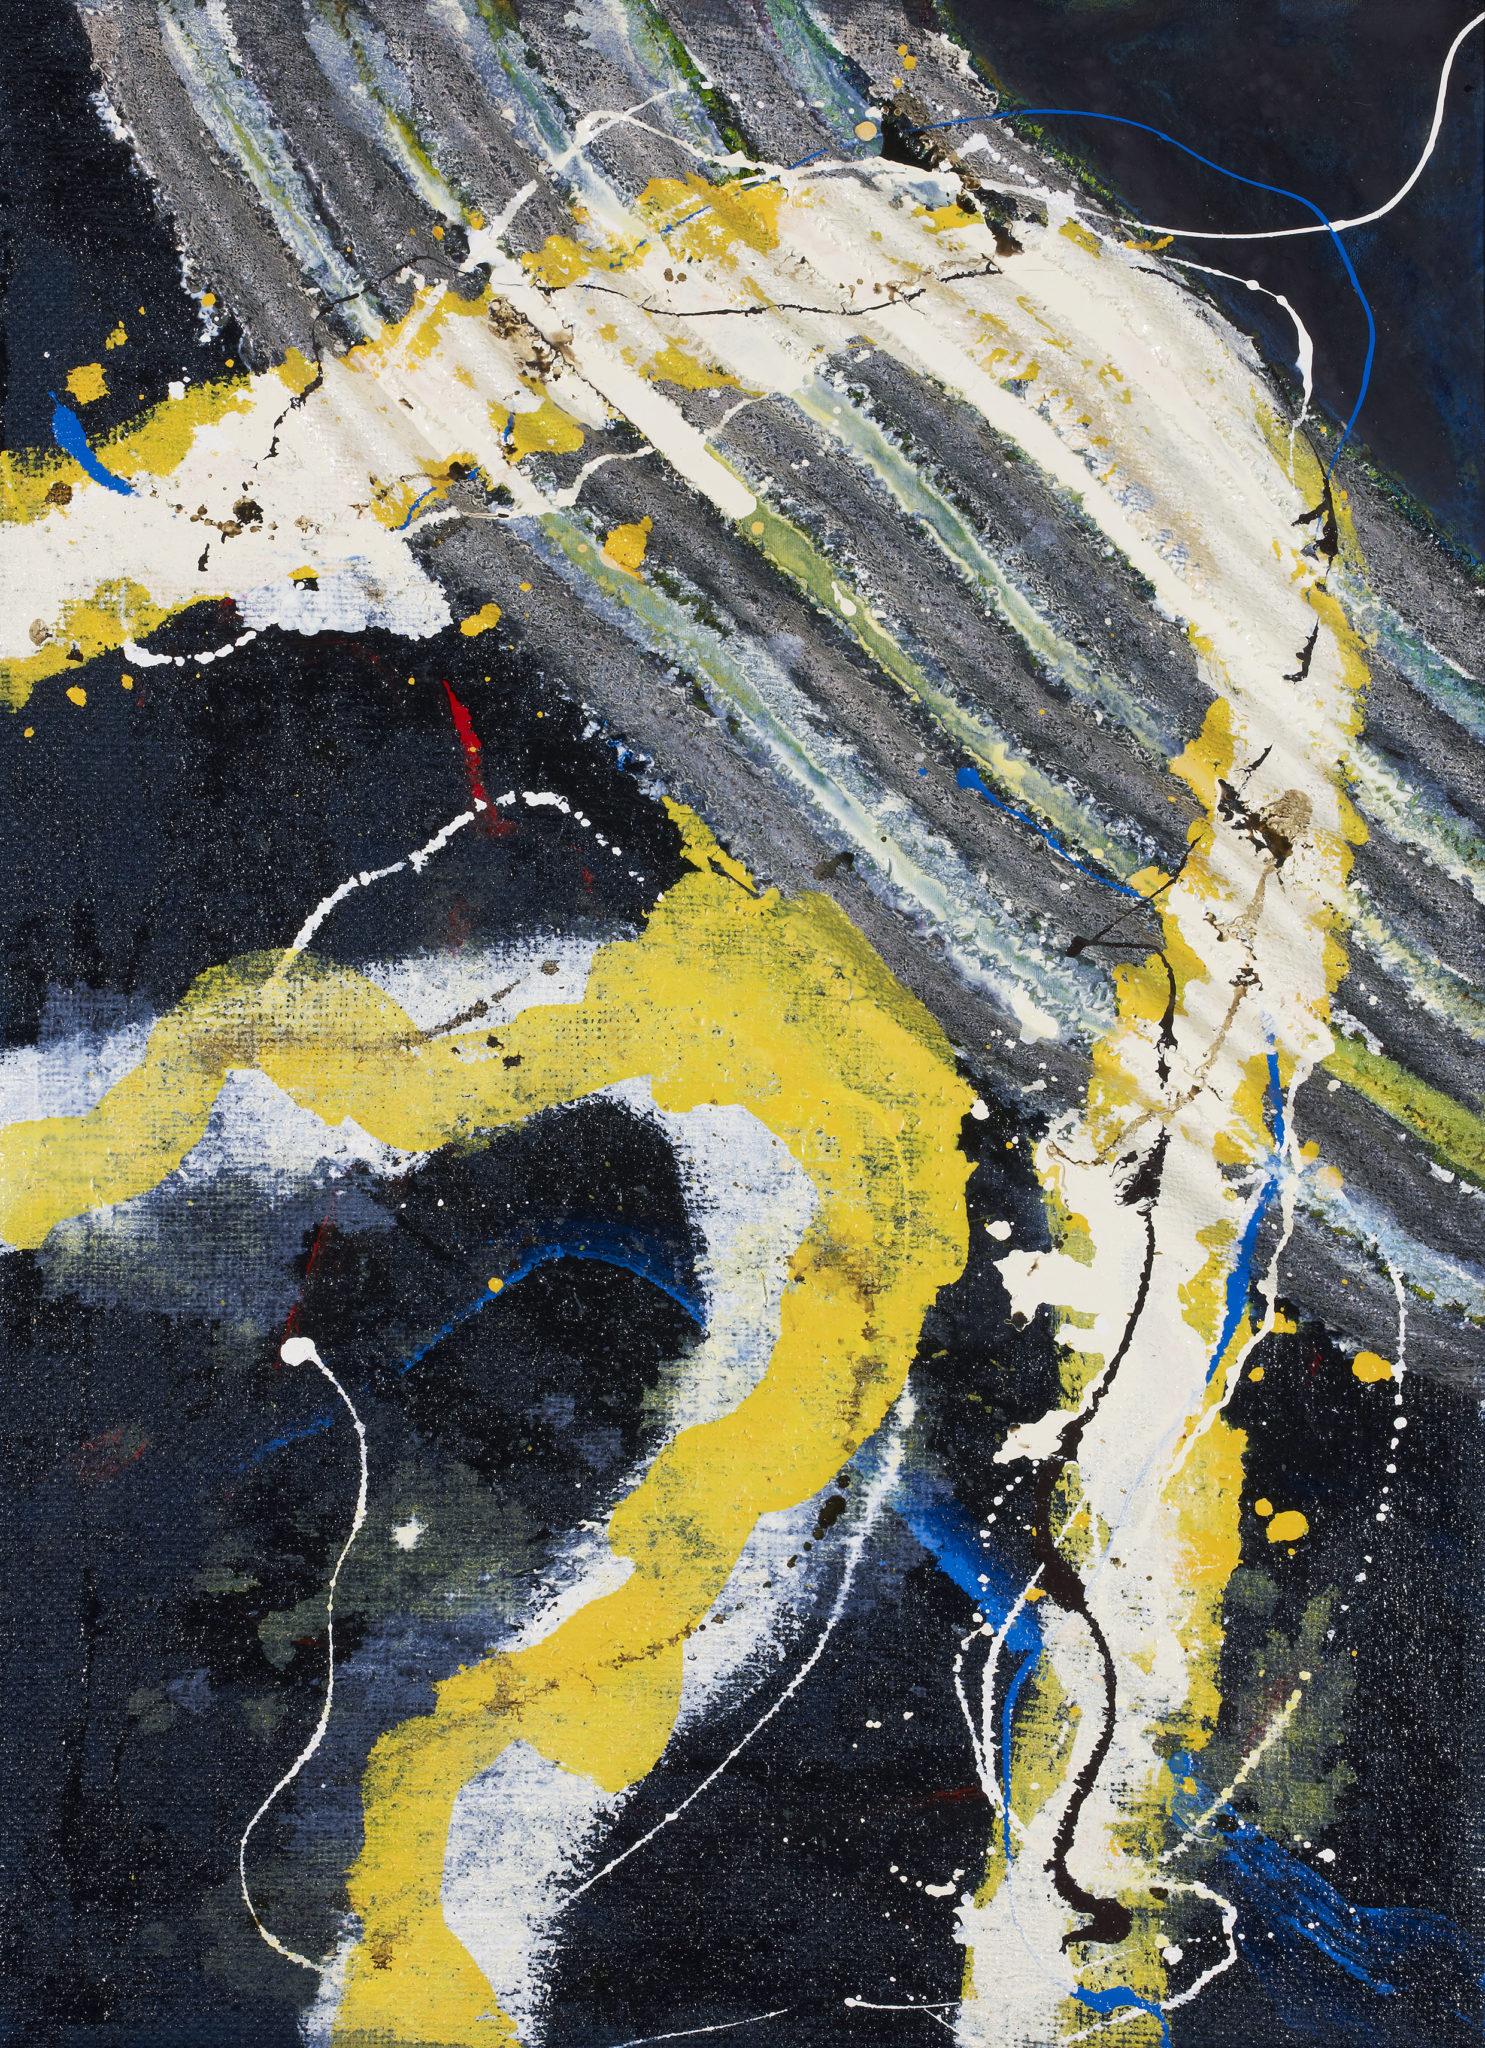 ARTISYOU Tsuyoshi MAEKAWA «Work 130918», 1994 Huile et jute sur toile 73 x 100 cm Courtesy galerie Artisyou